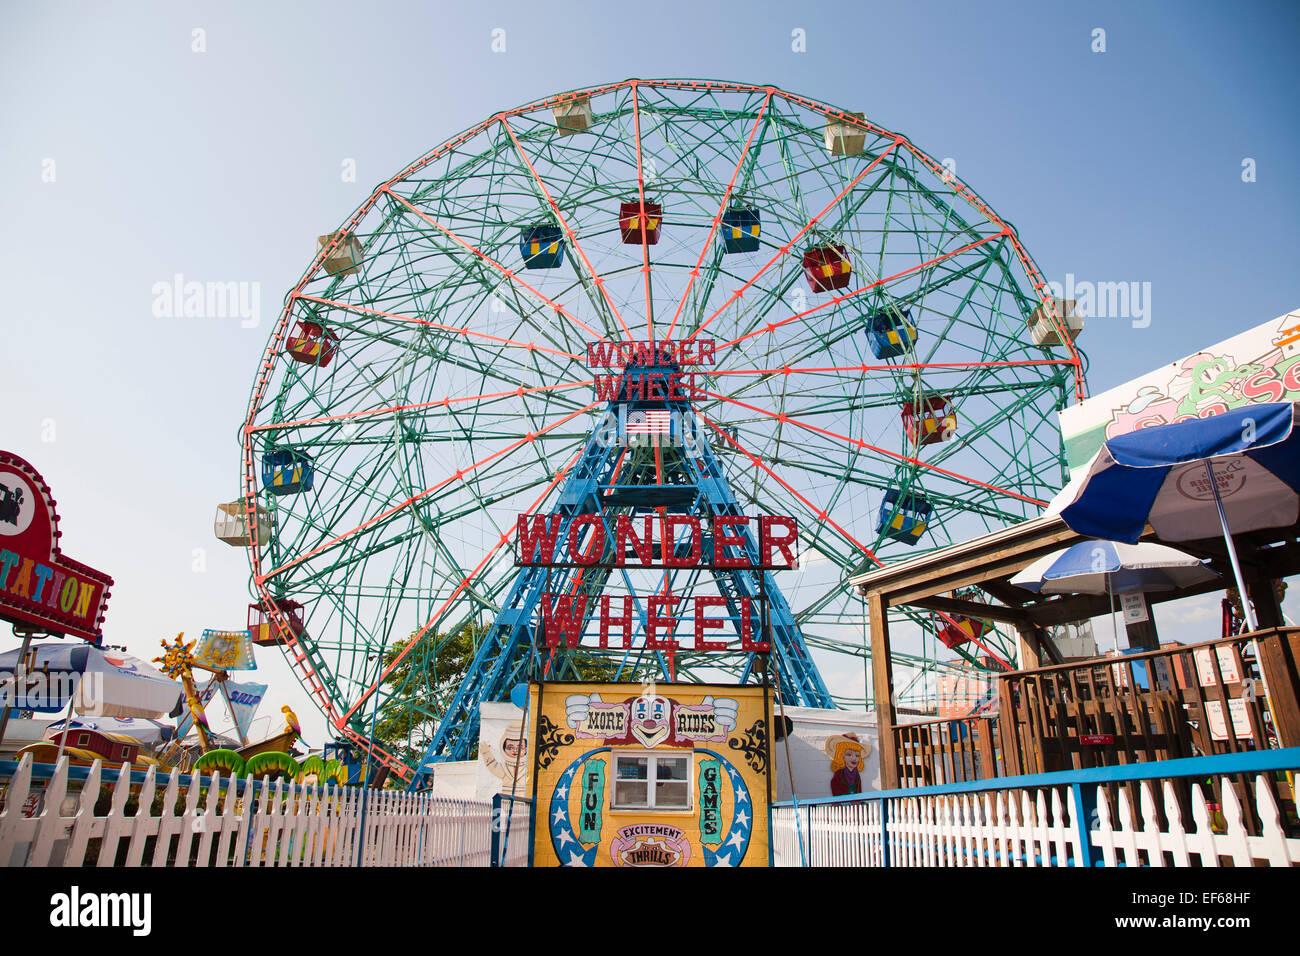 wonder wheel, amusement park, Coney Island, New York, USA, America - Stock Image